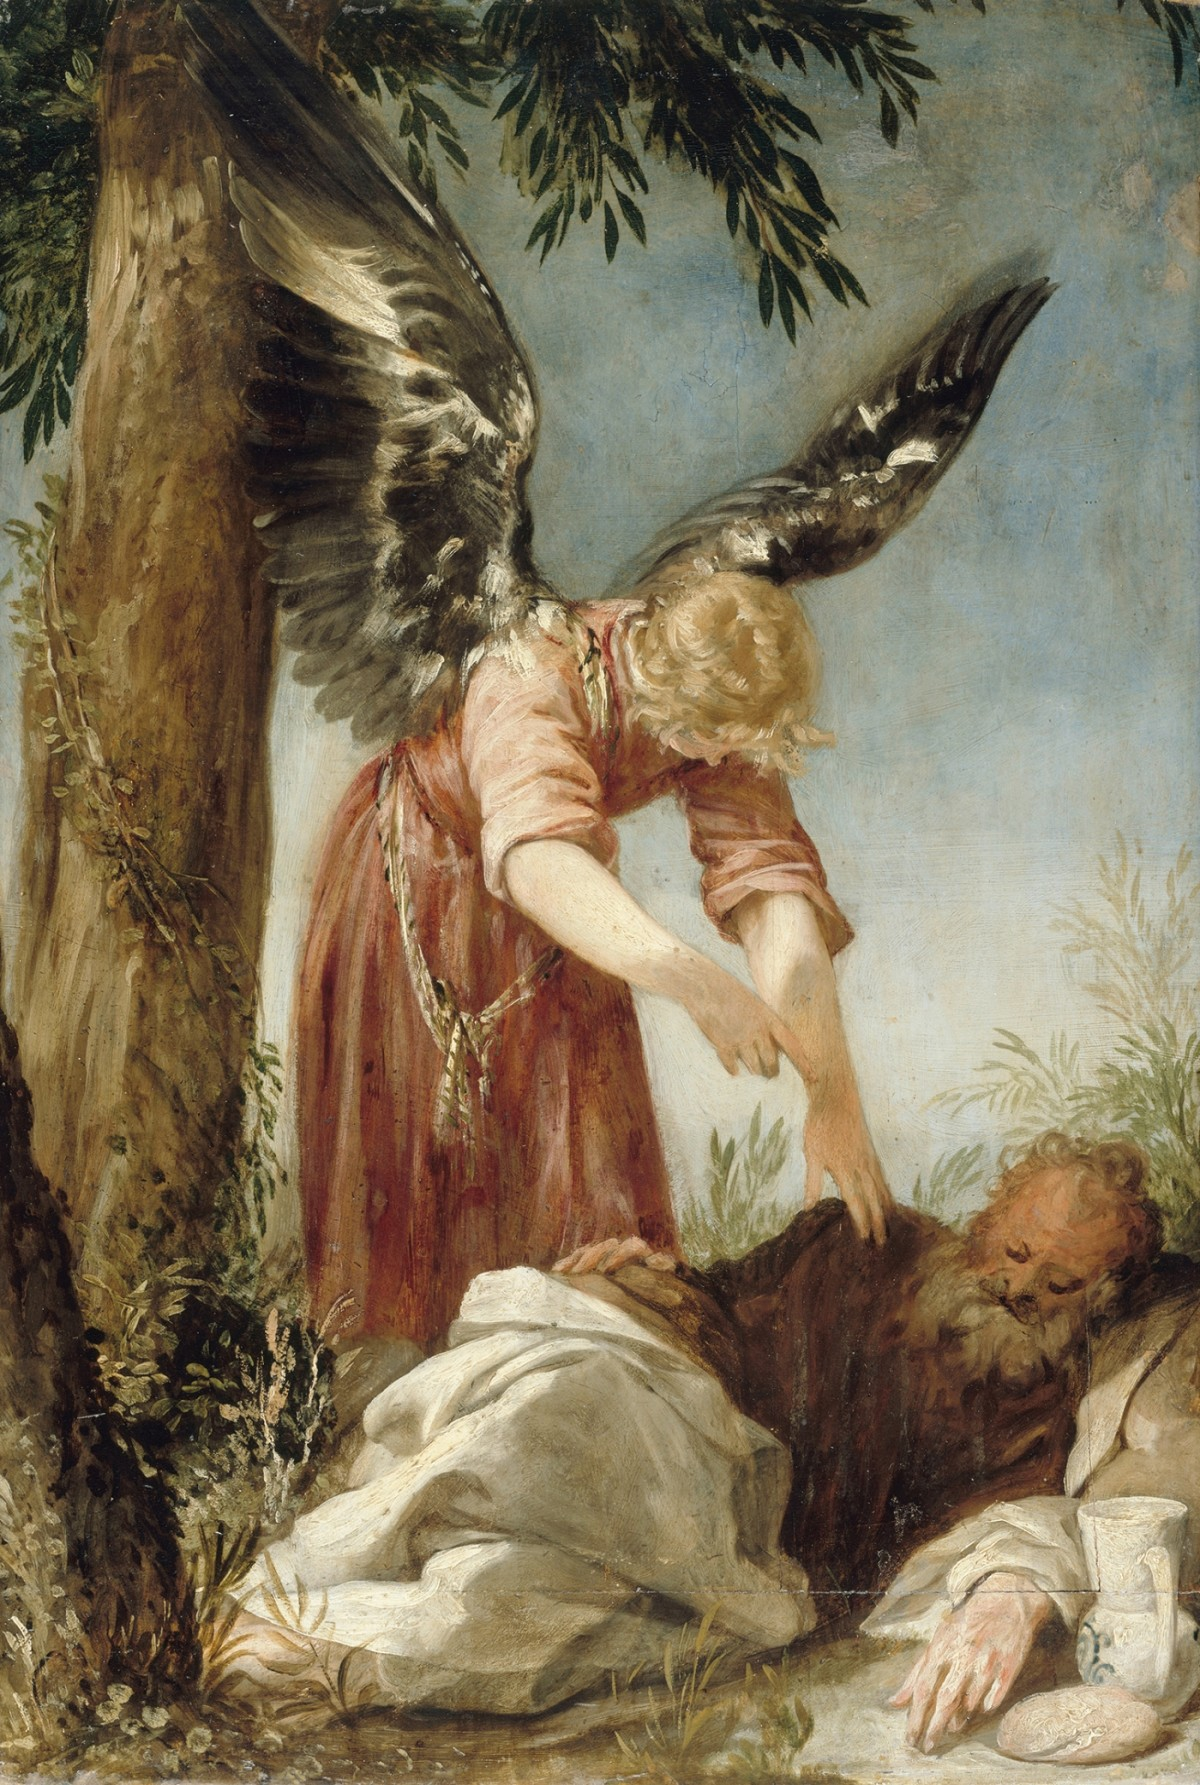 Juan Antonio de Frias y Escalante: Der Engel erweckt den Propheten Elias in der Wüste, um 1650/60, © Staatliche Museen zu Berlin, Gemäldegalerie (Foto: Jörg P. Anders)